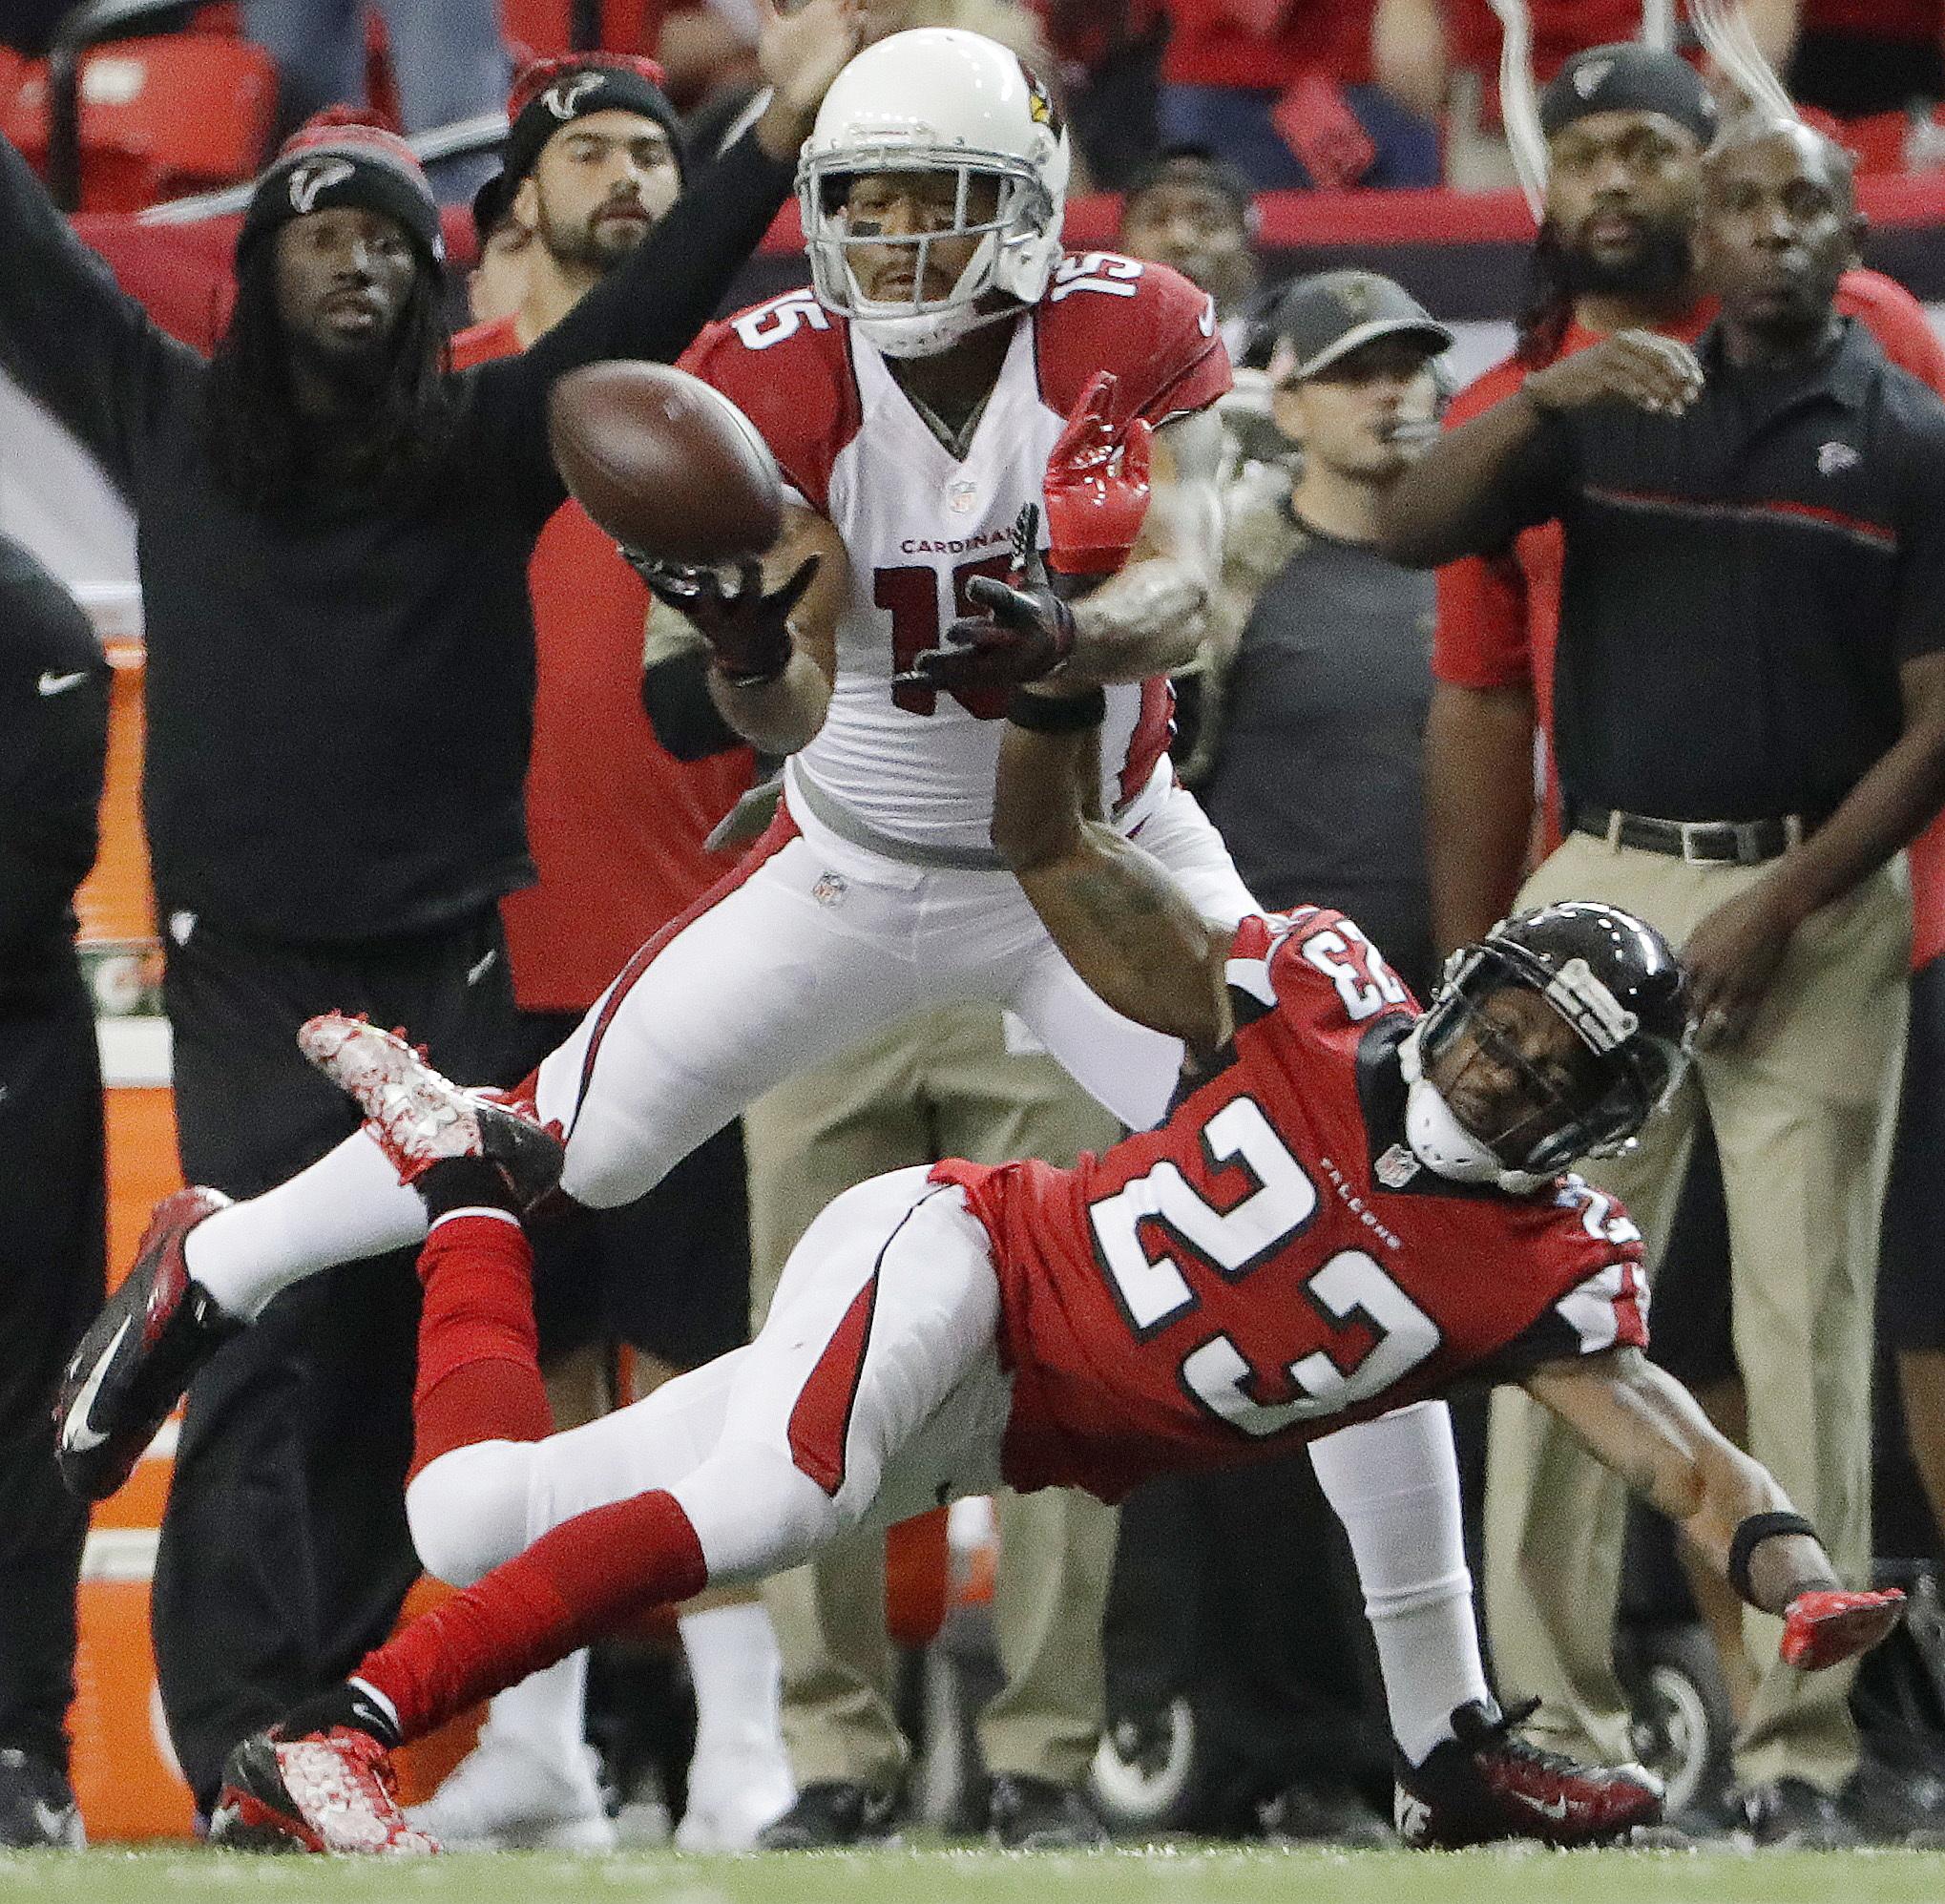 Arizona Cardinals wide receiver Michael Floyd (15) misses the catch against Atlanta Falcons cornerback Robert Alford (23) during the second of an NFL football game, Sunday, Nov. 27, 2016, in Atlanta. (AP Photo/David Goldman)